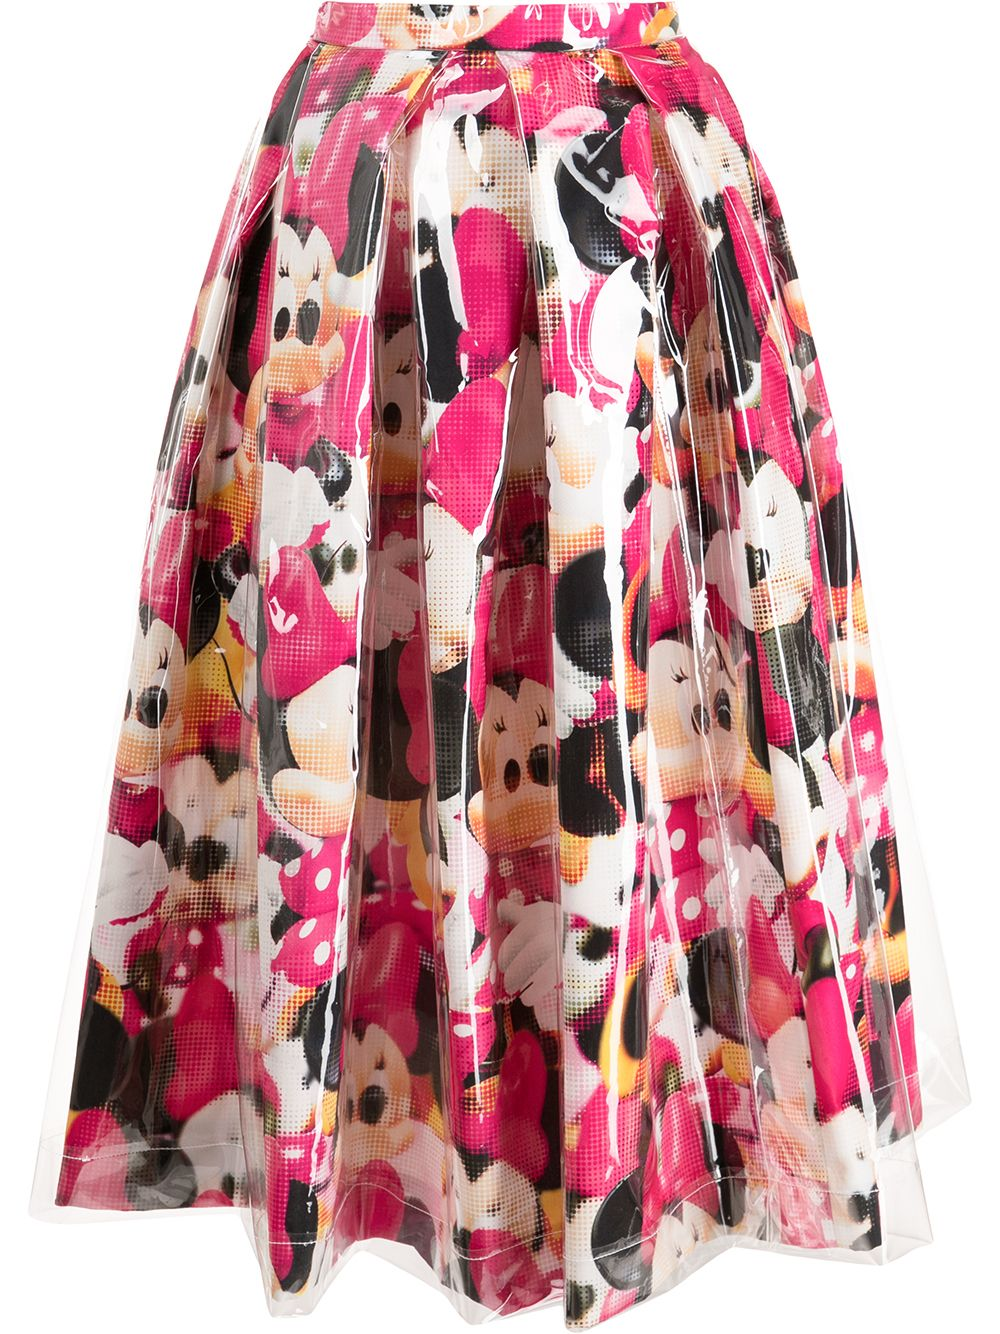 COMME DES GARCONS | Skirt | GG-S009-0511